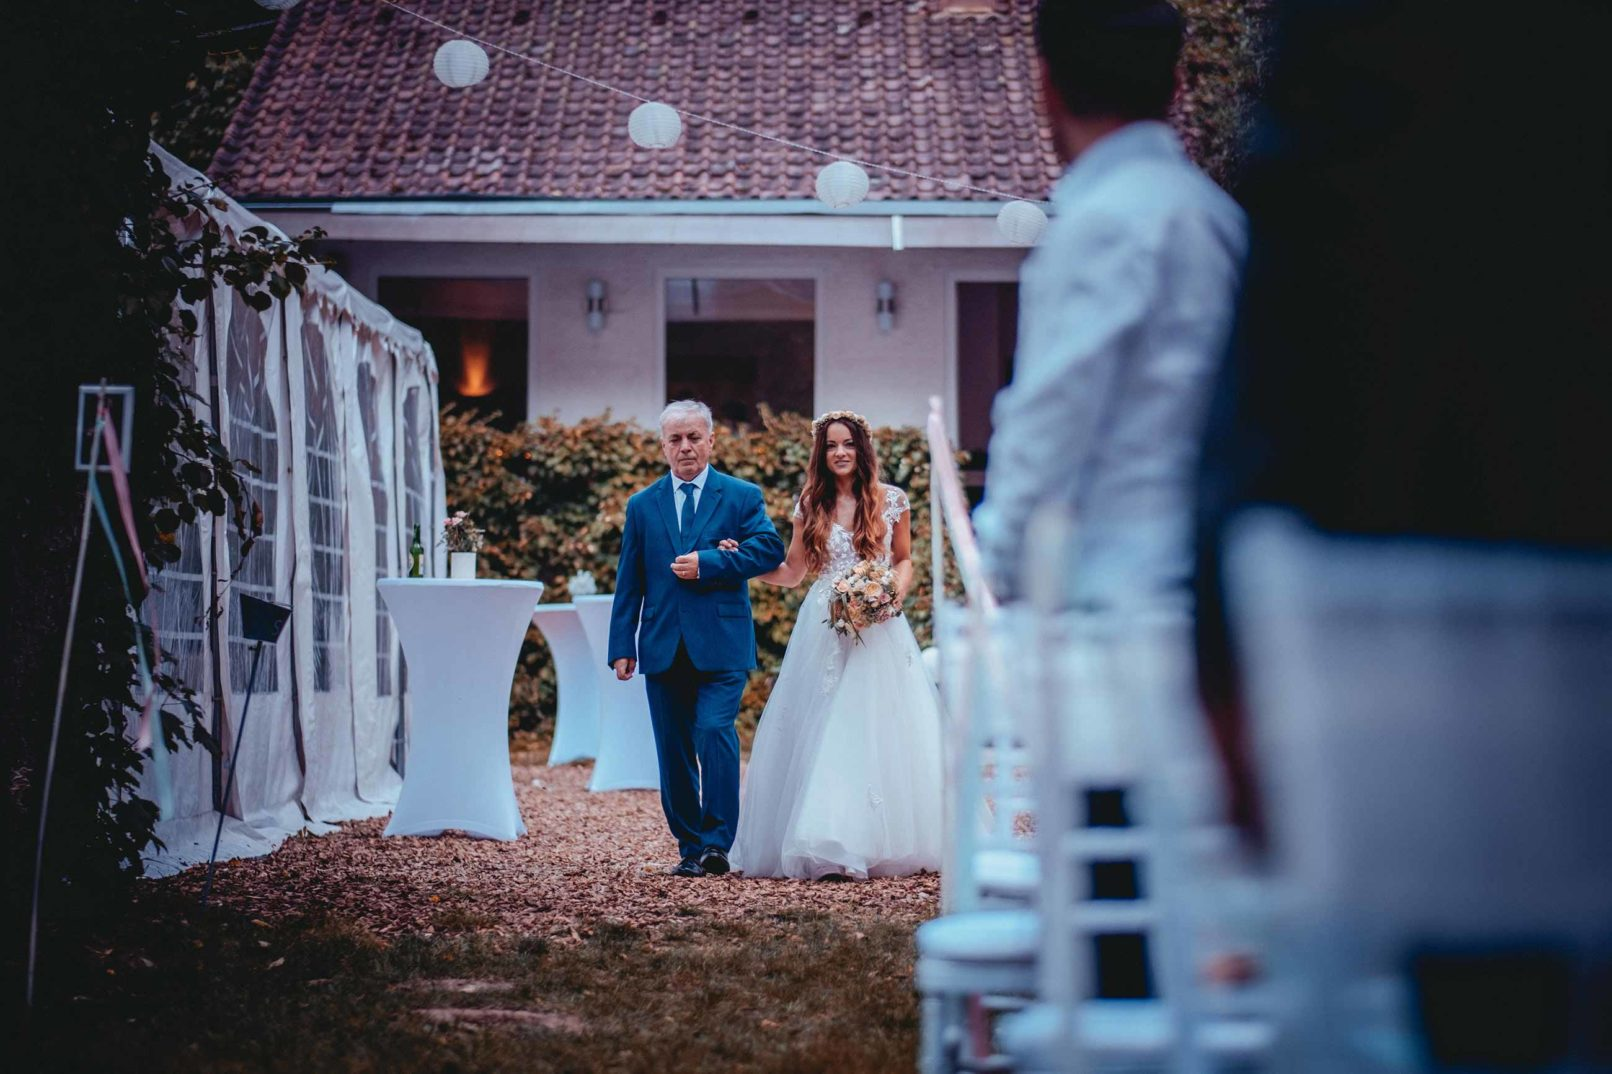 Hochzeitsfotograf • Vitali Skidan Hochzeitsfotograf Würzburg